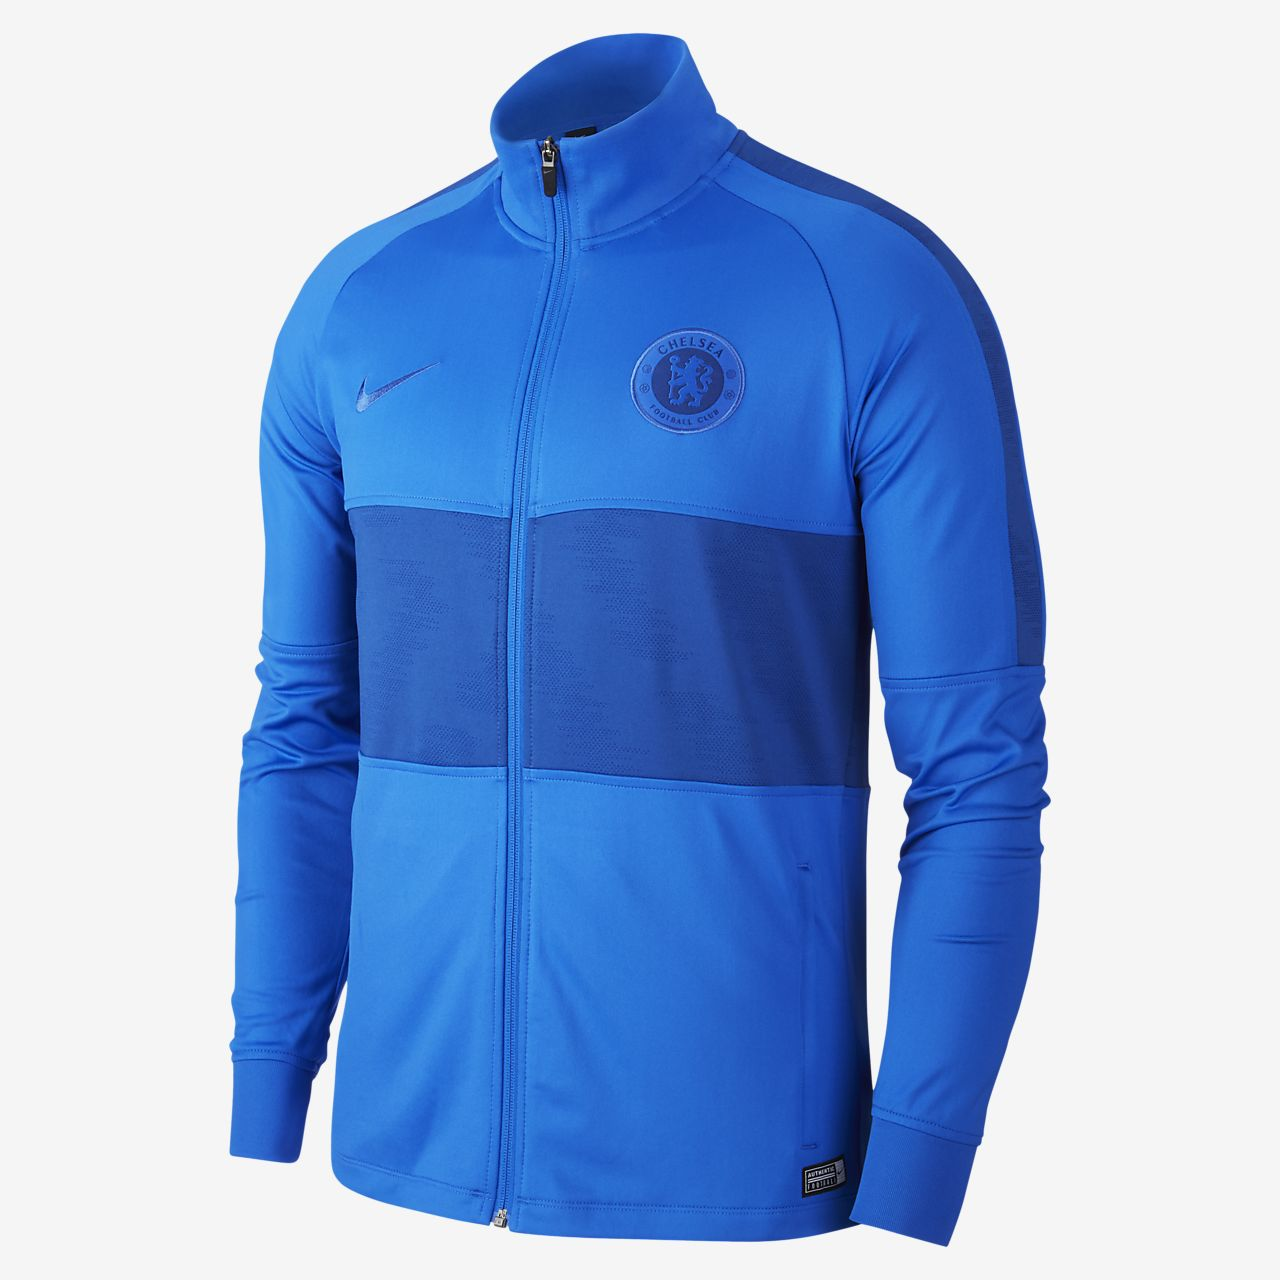 Chelsea FC Men's Football Jacket